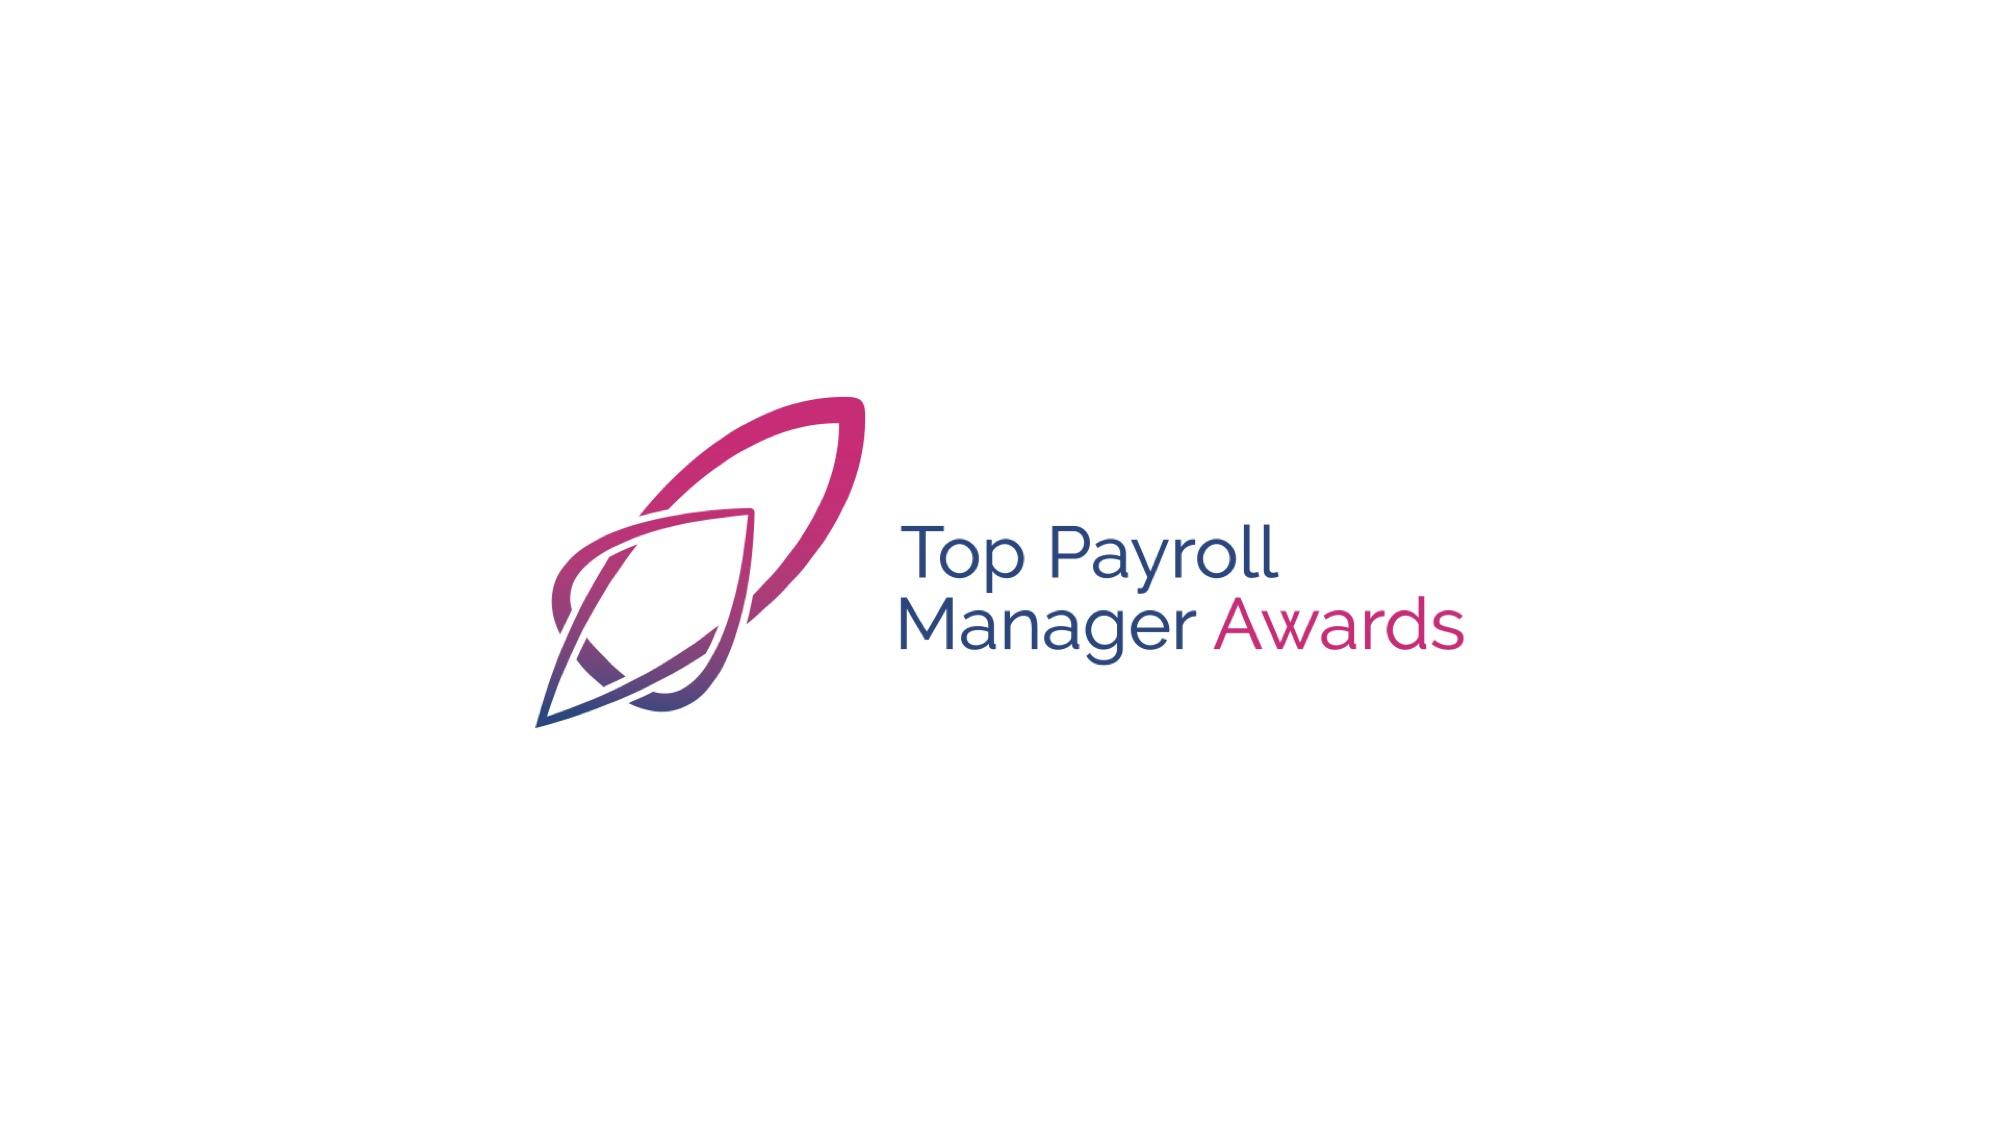 top payroll manager awards